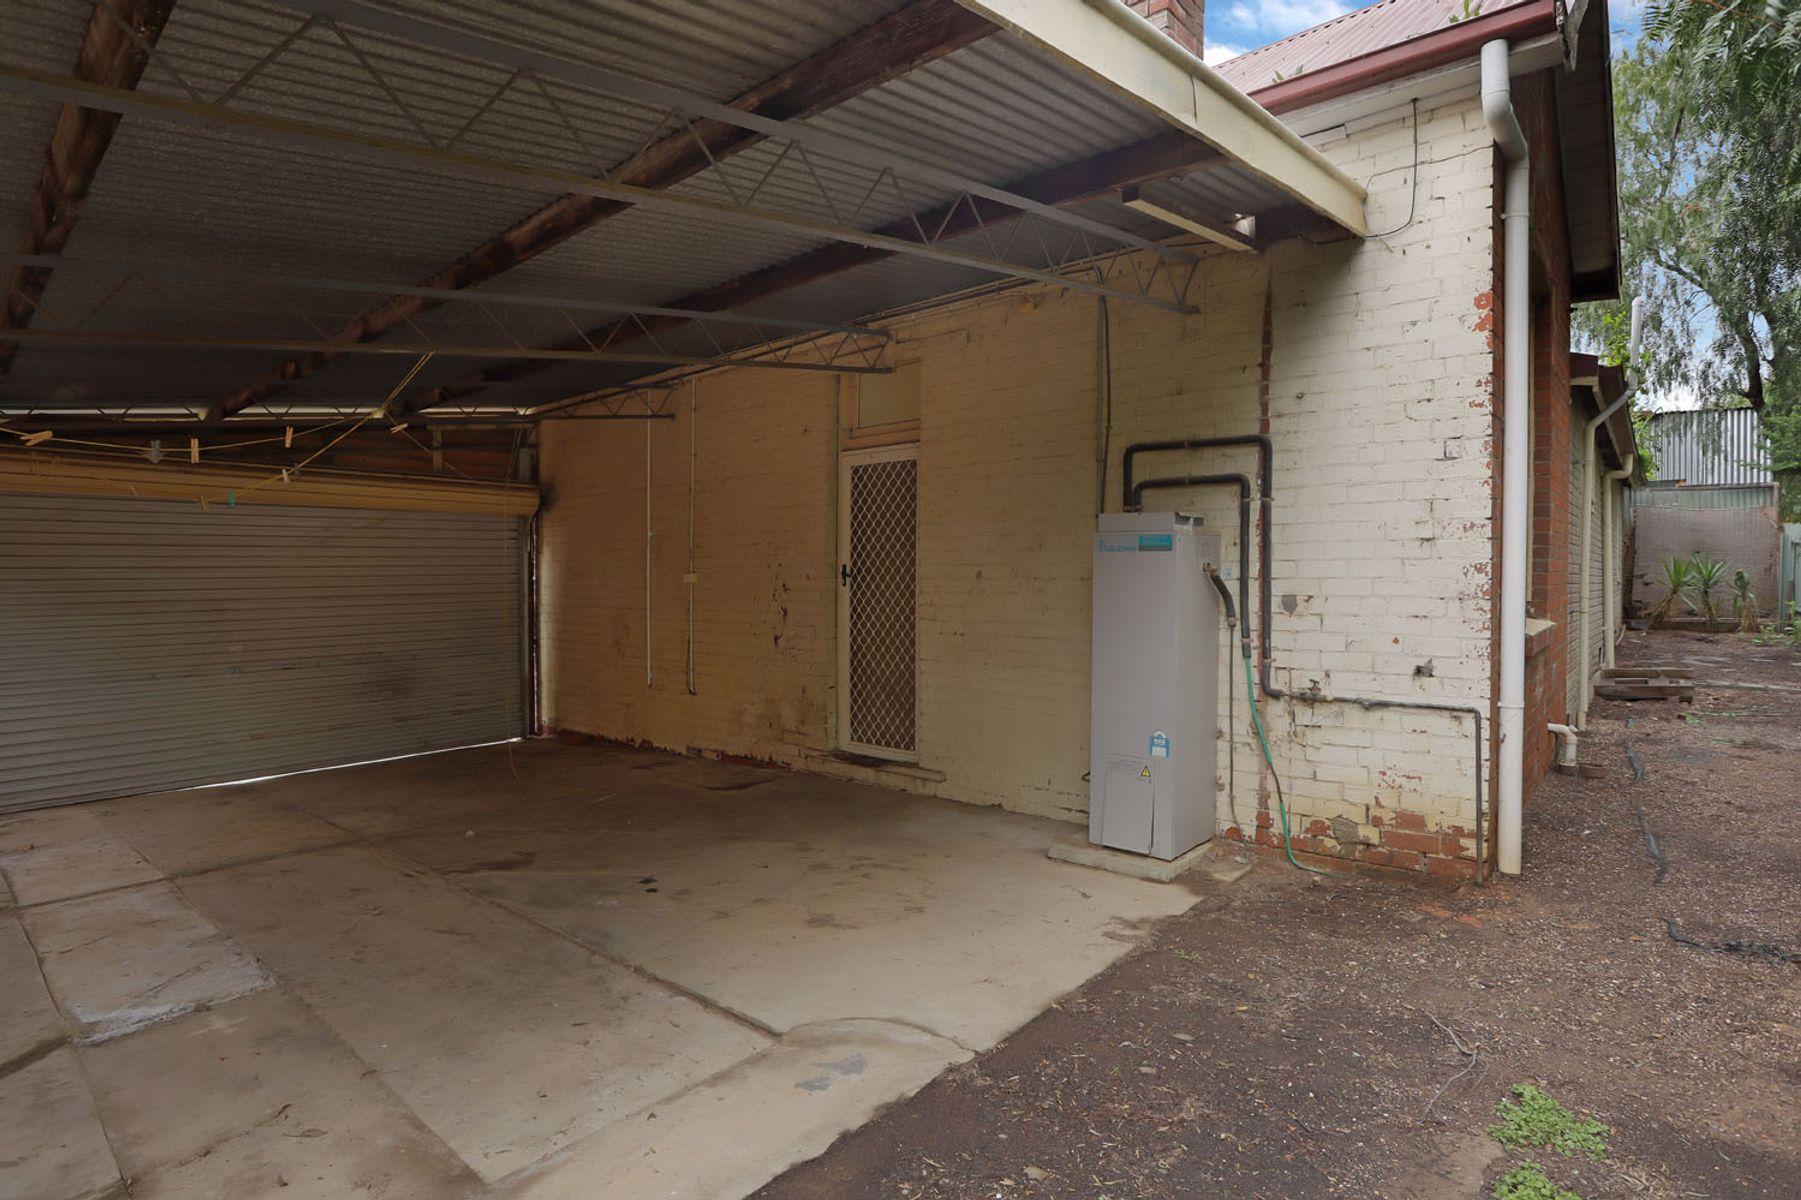 34 Galvin Street, Bendigo, VIC 3550